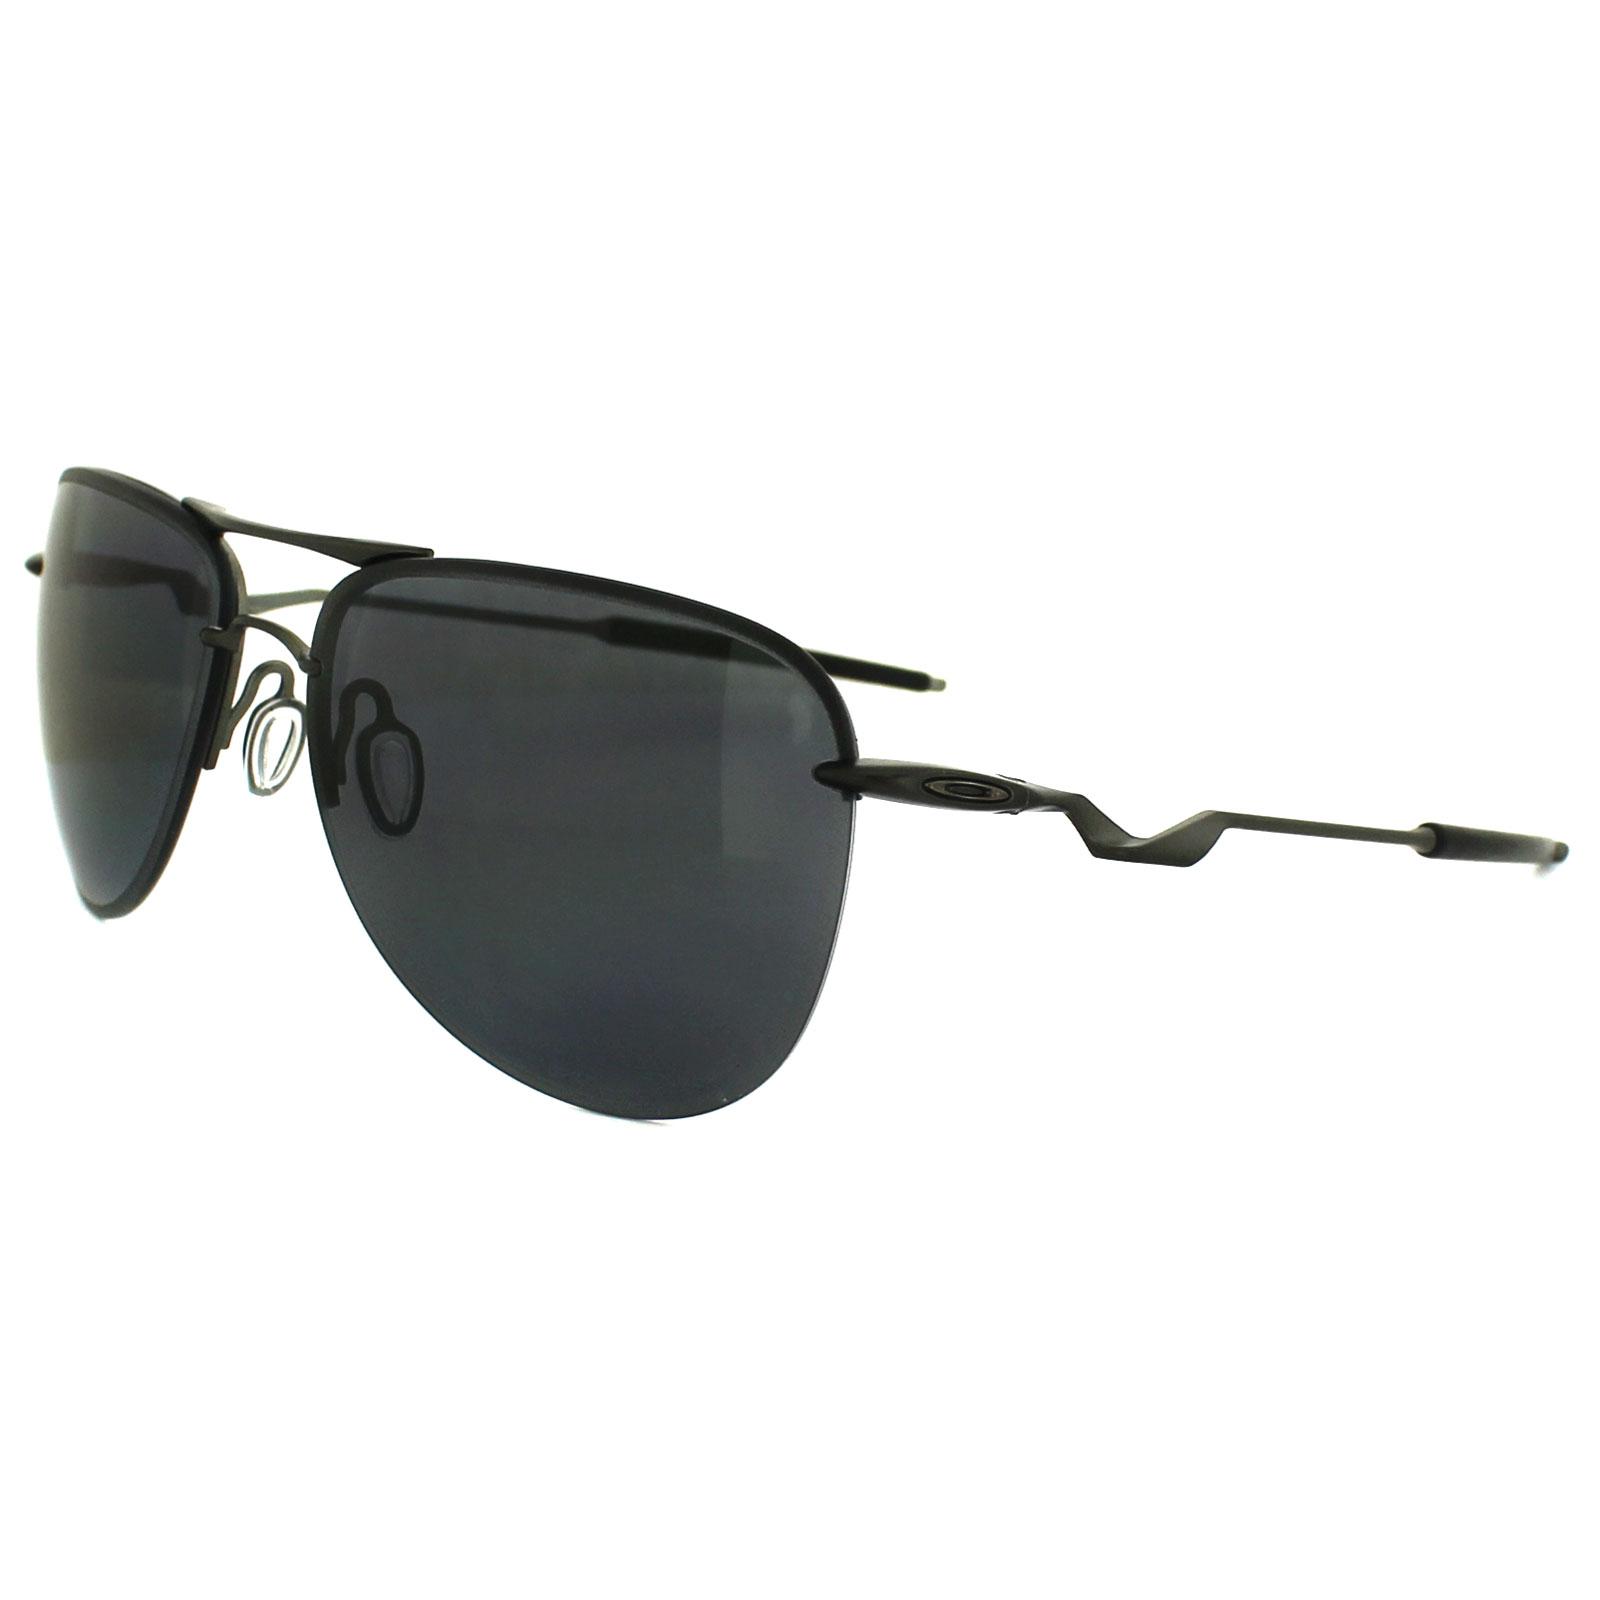 a6165a904a38d ... shop sentinel oakley sunglasses tailpin oo4086 05 carbon grey polarized  53c03 f8c9d